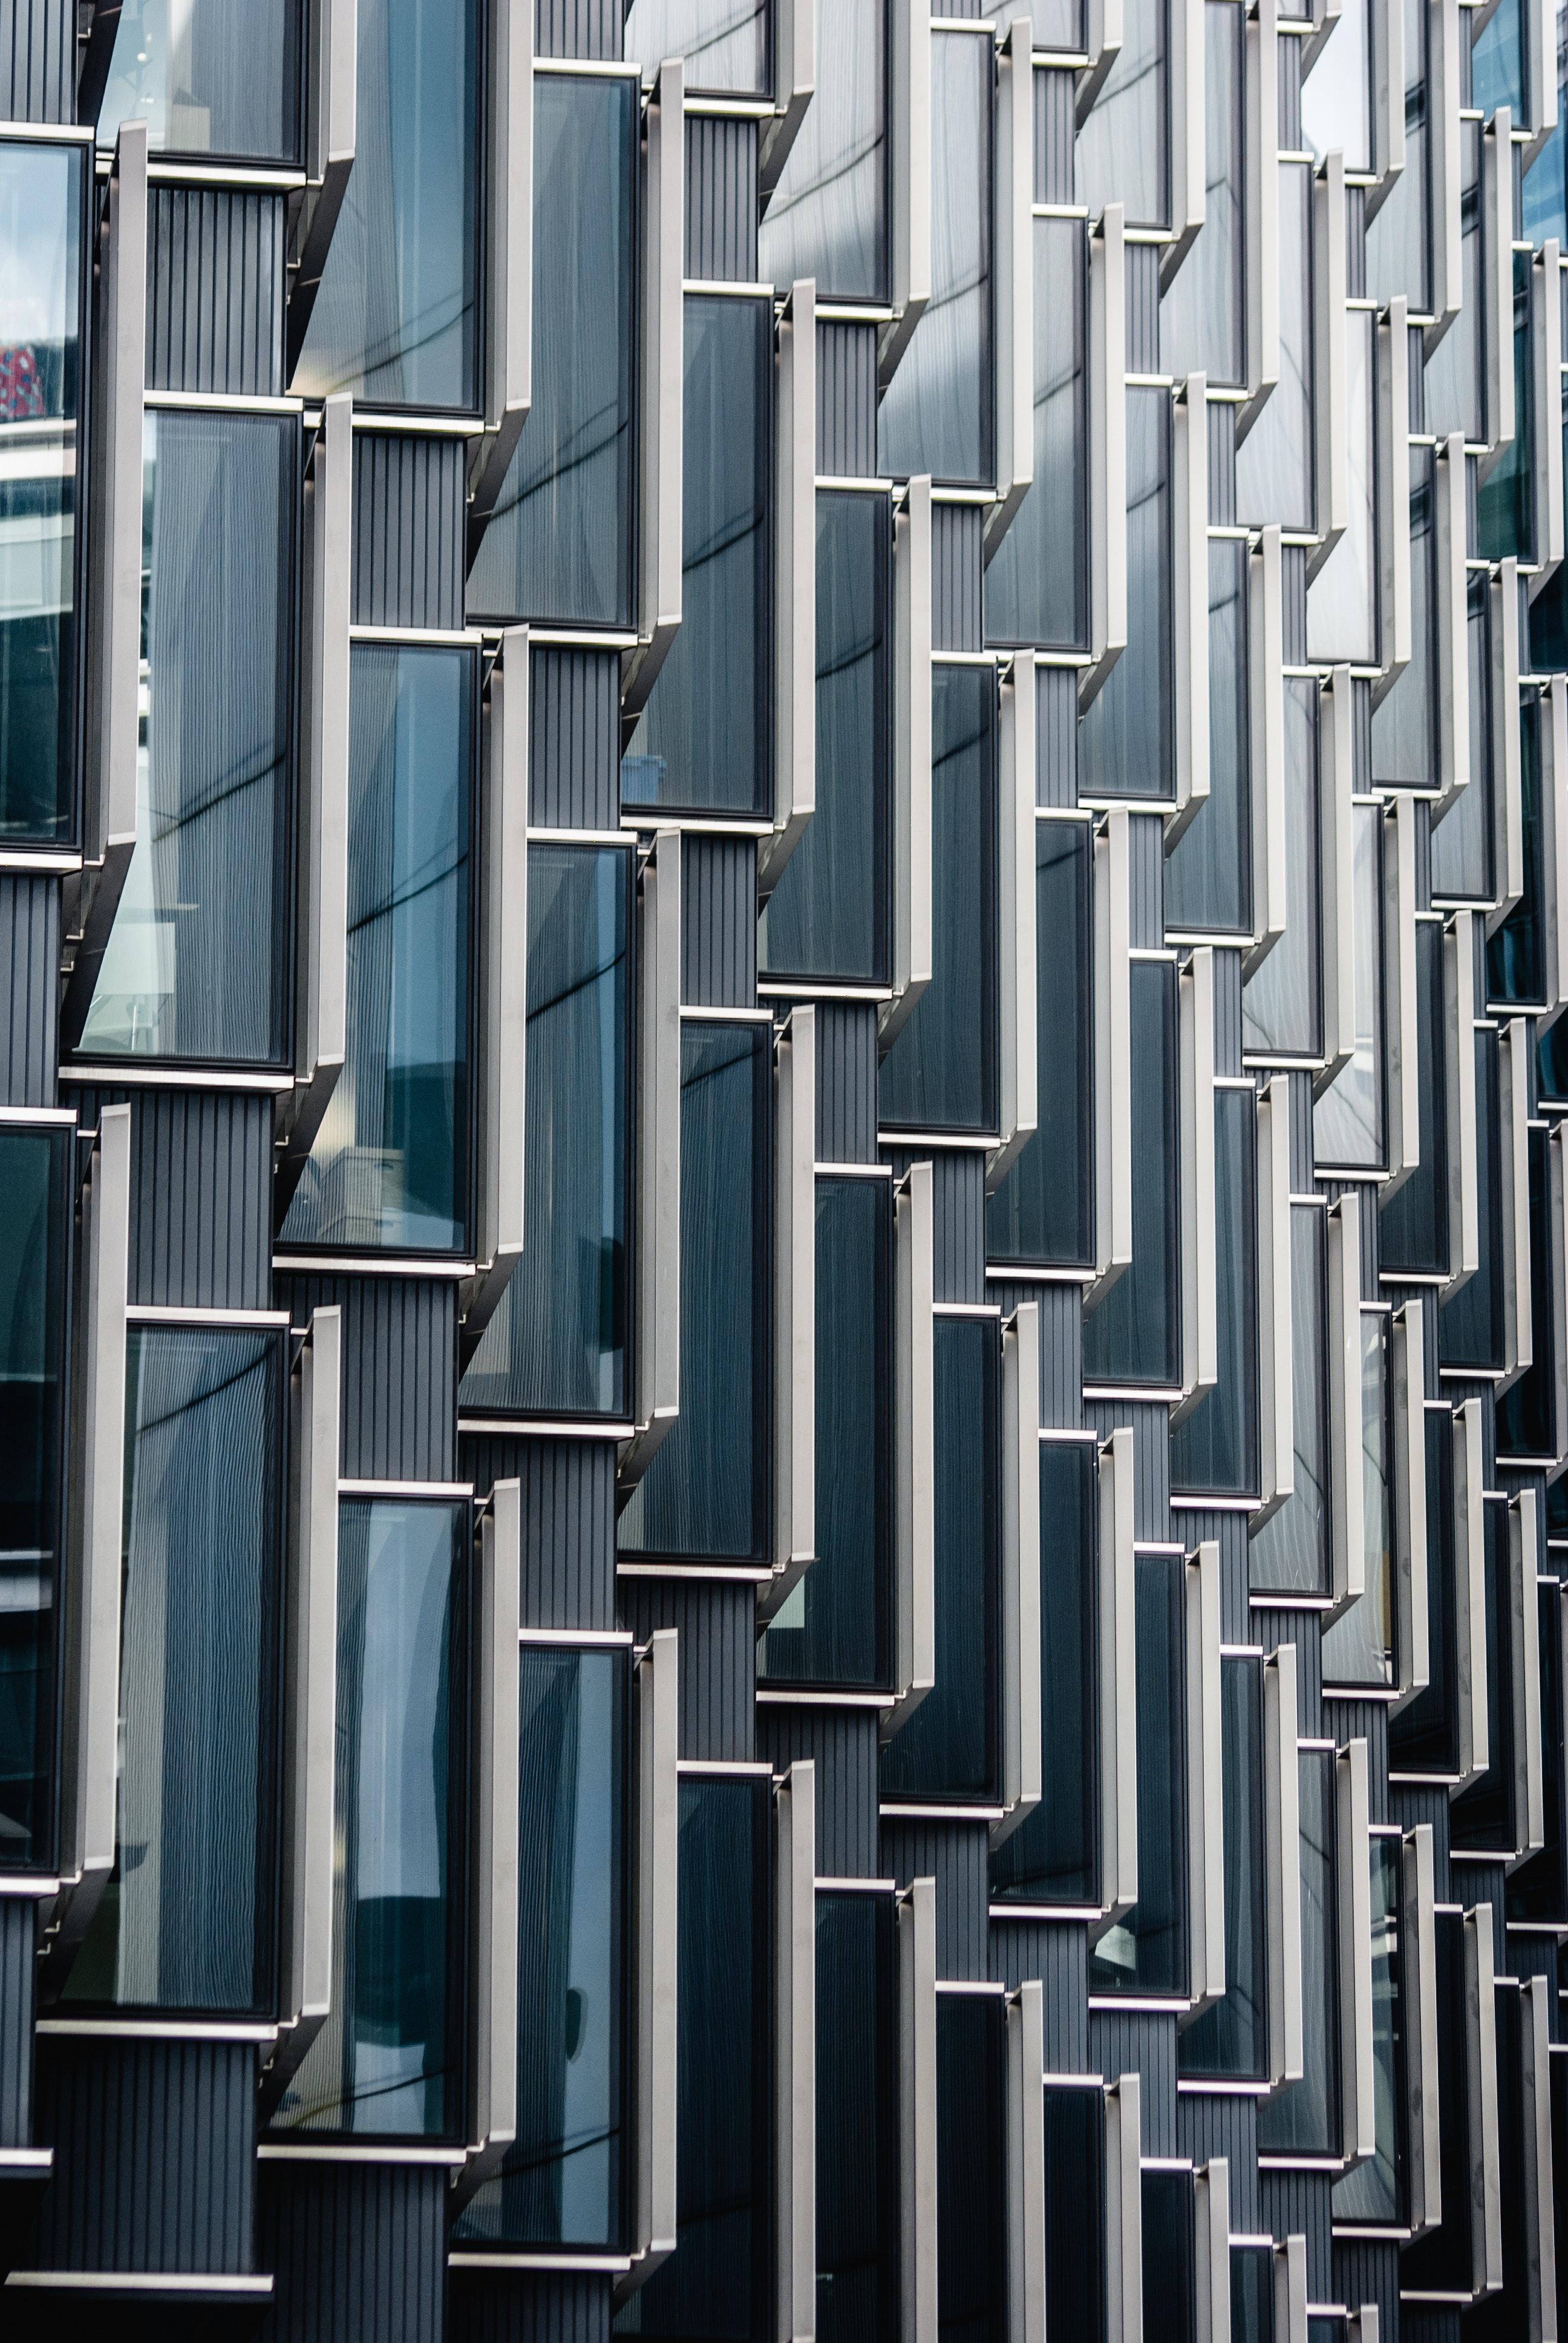 FREE IMAGES ALUMINUM ARCHITECTURE DESIGN GLASS ITEMS METAL